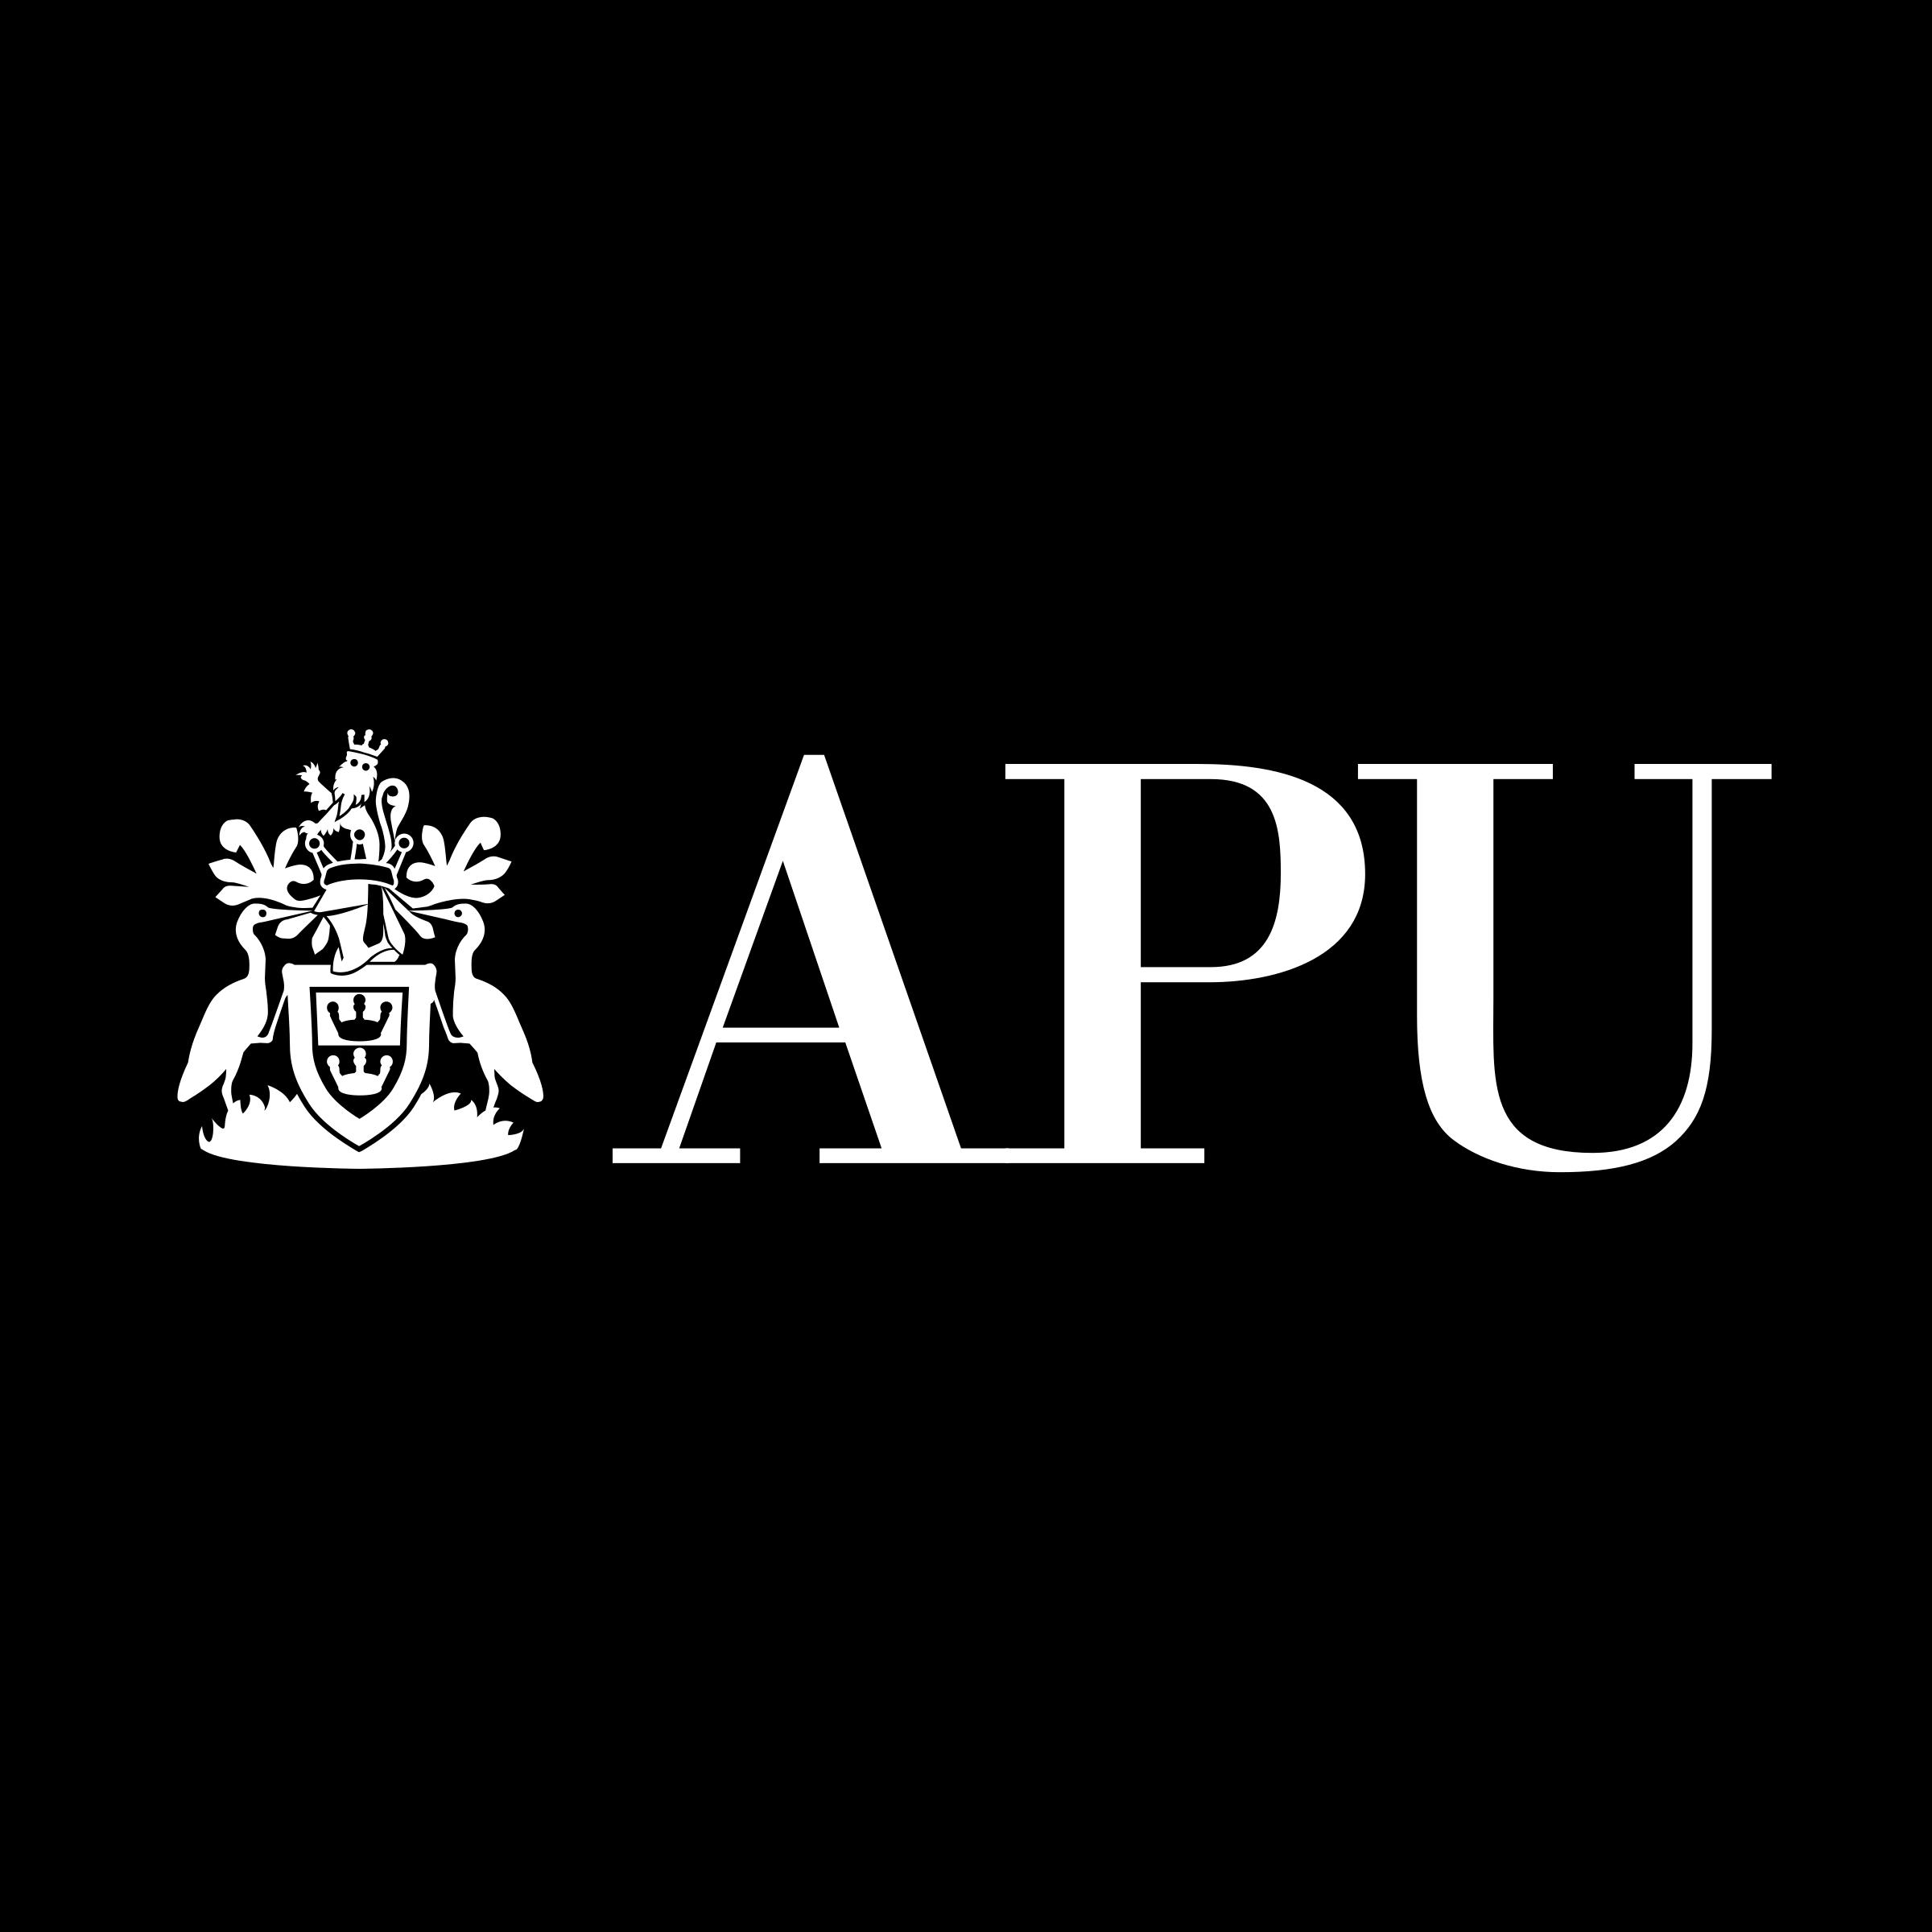 APU 01 Logo PNG Transparent & SVG Vector.